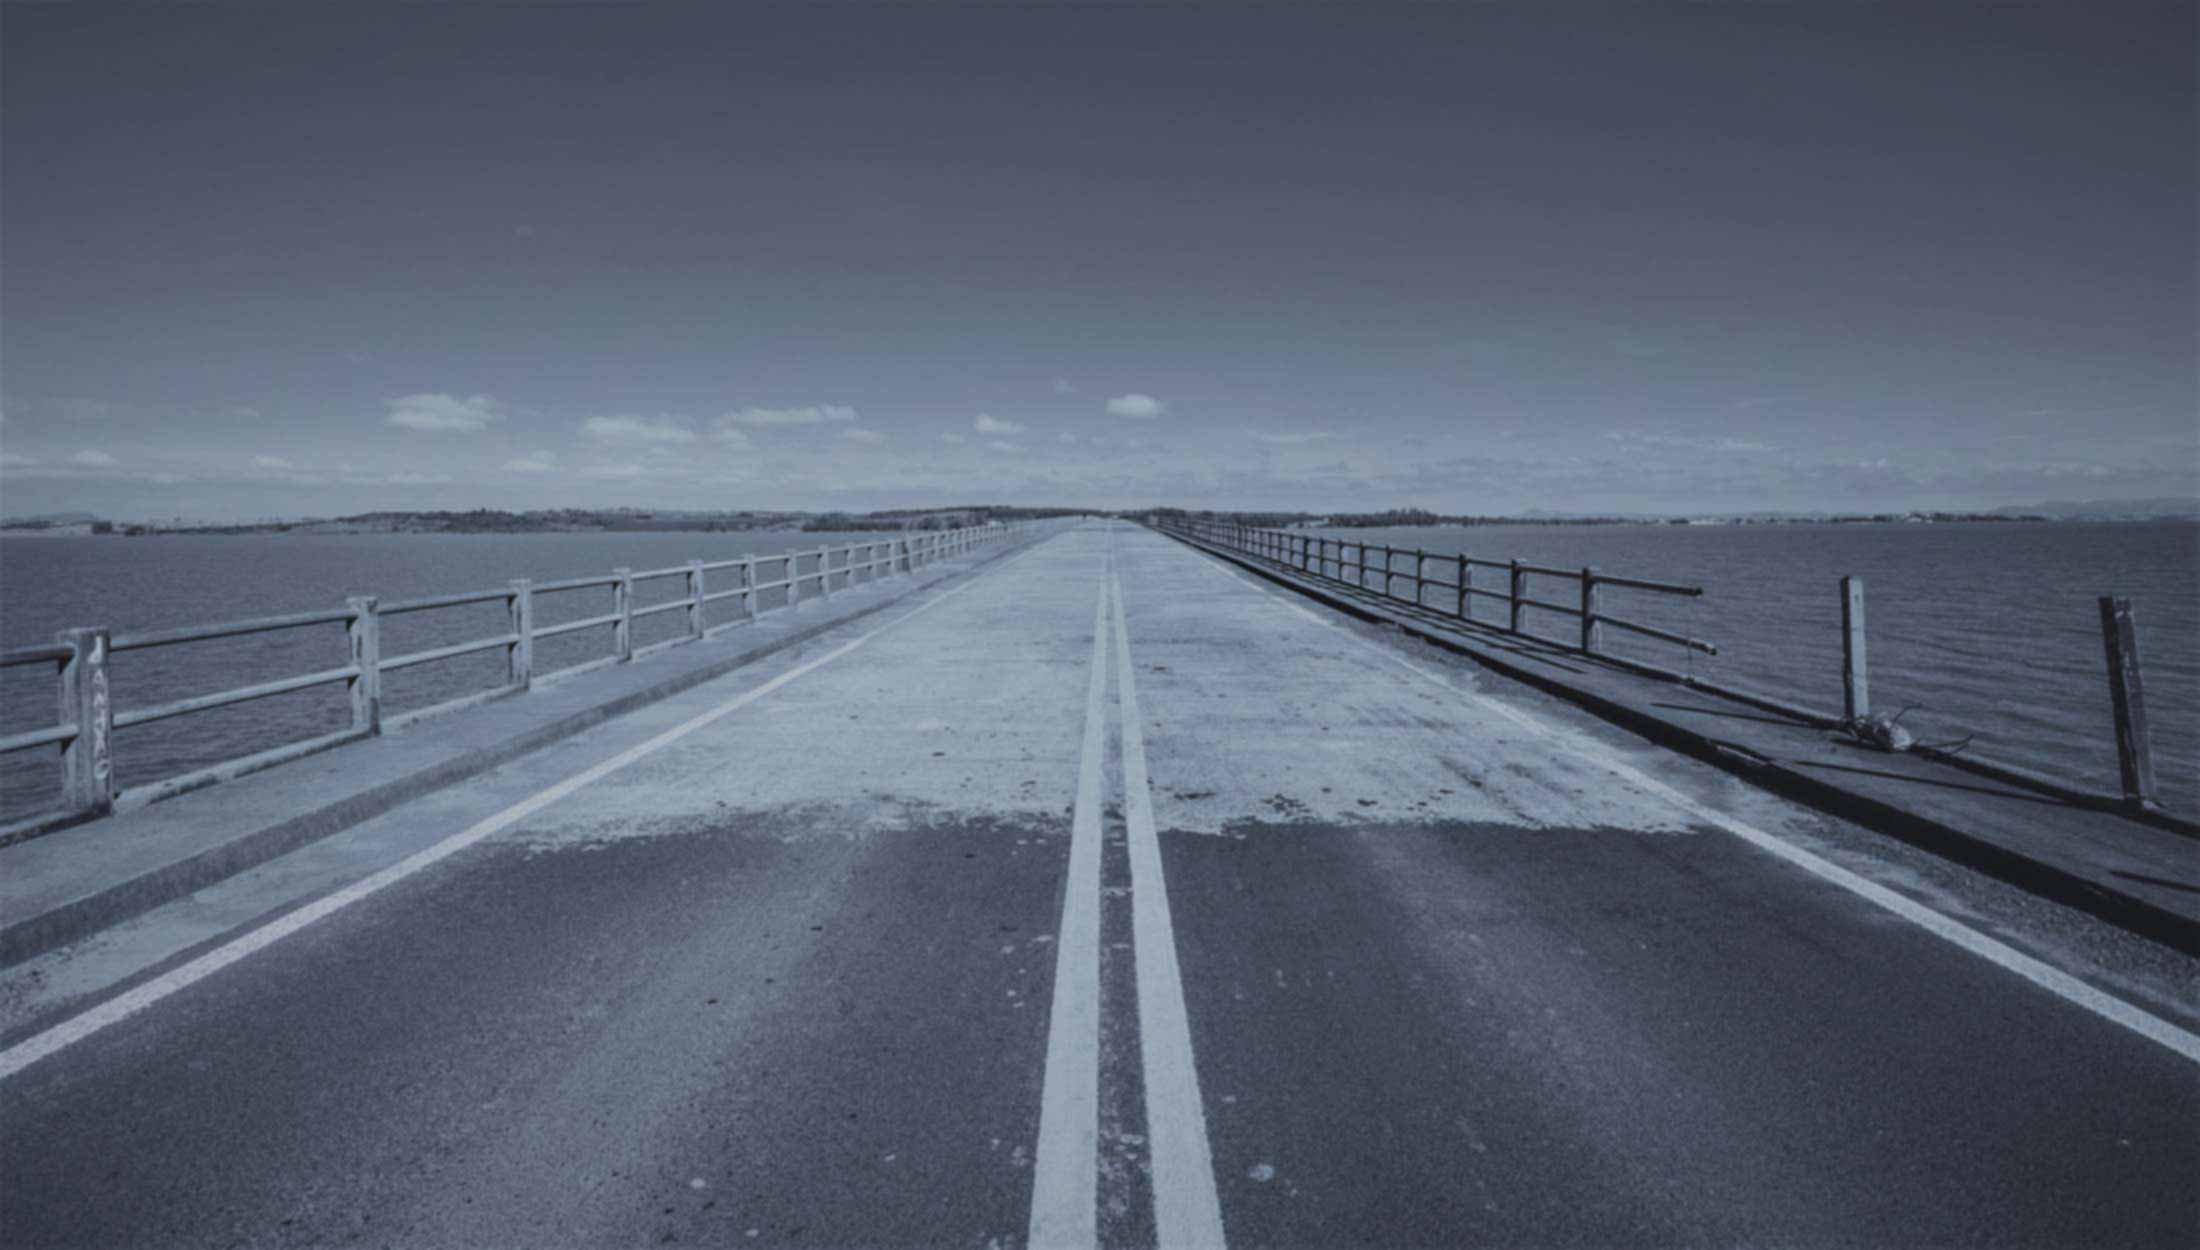 bridge across the water